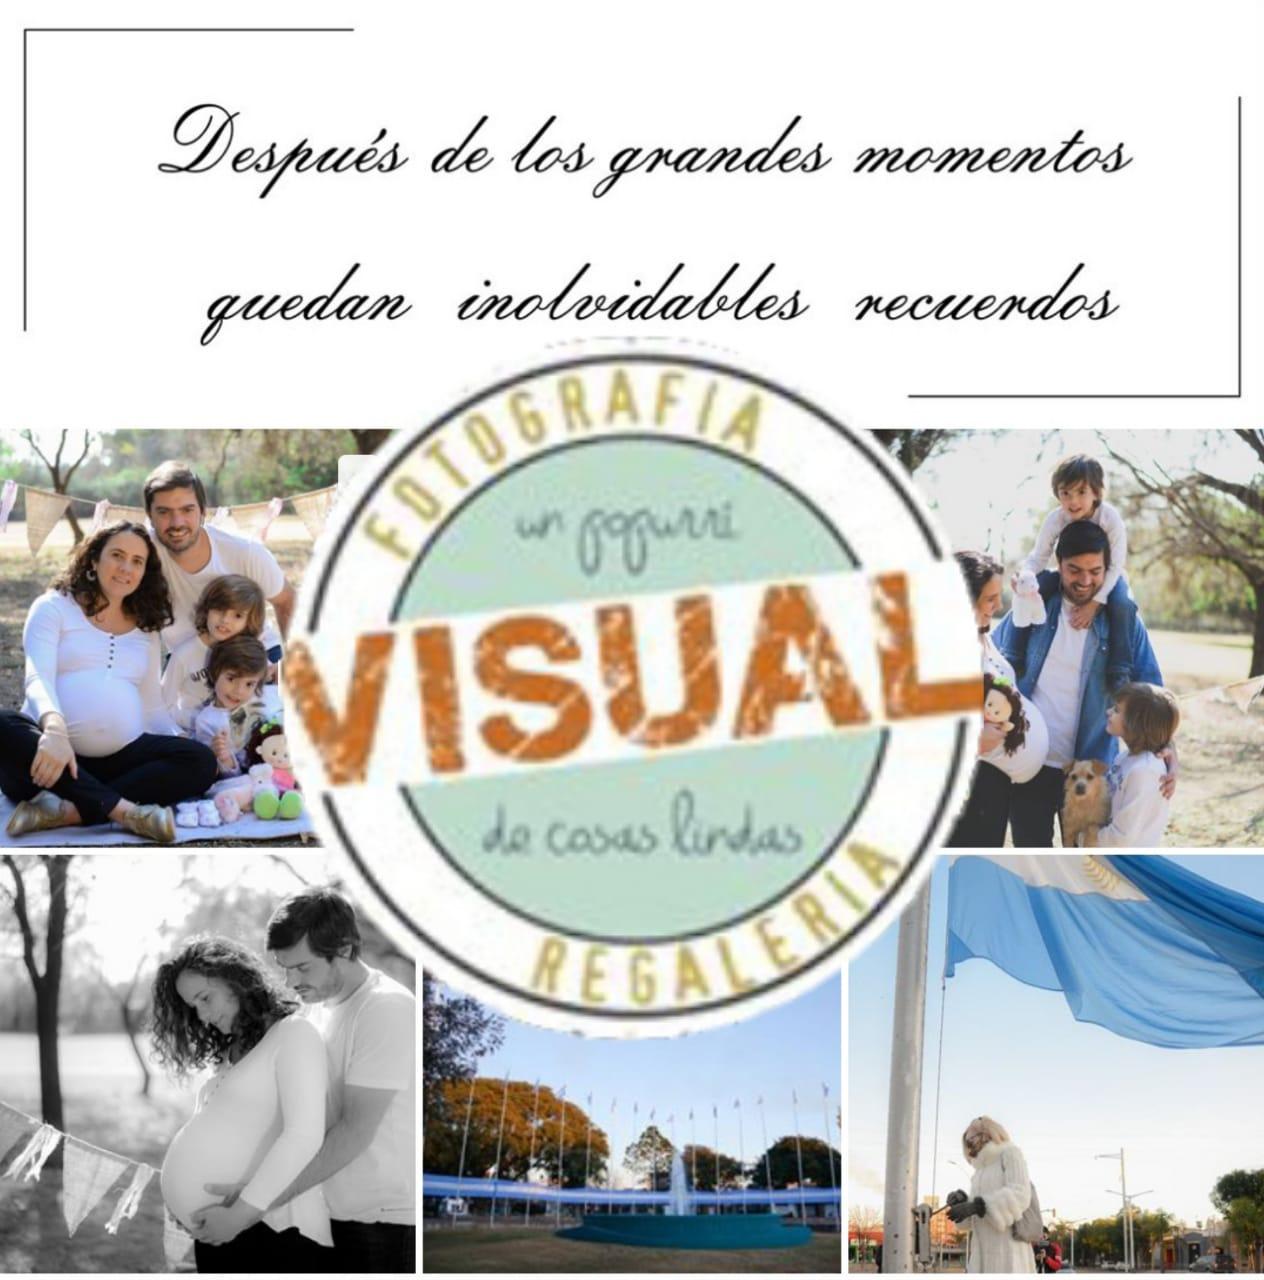 VISUAL FOTOGRAFIA Y REGALERIA